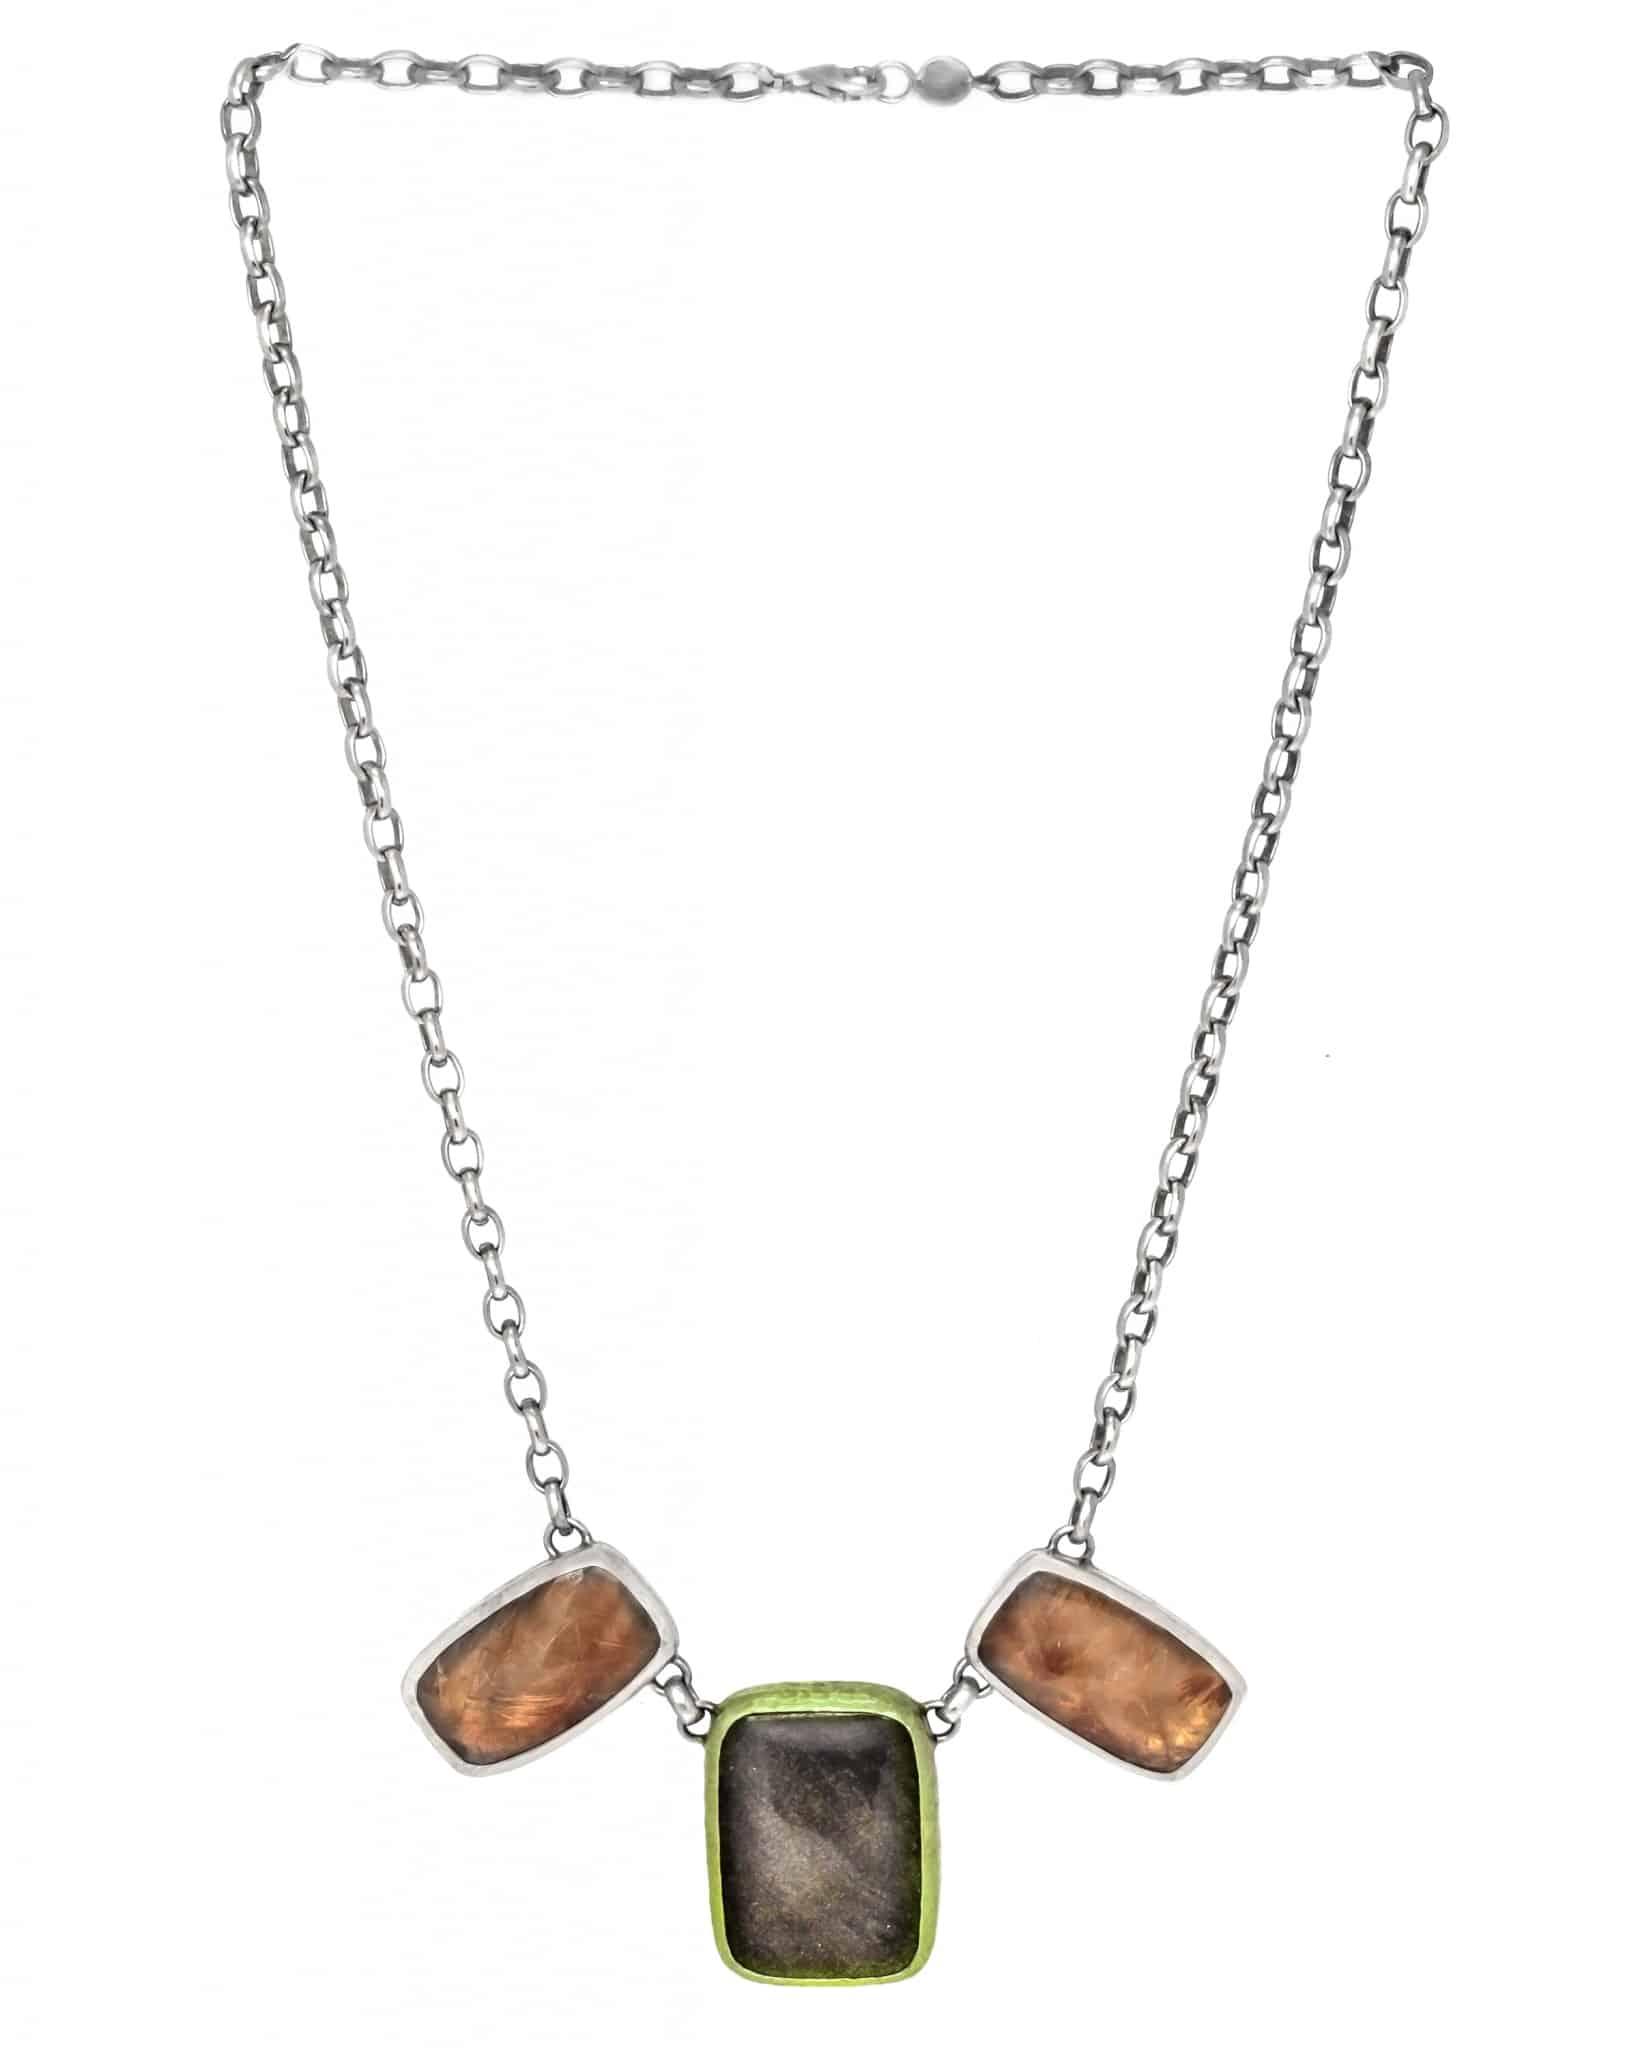 Necklaces, Silver, Silver, 2017, One Size CHANTECLER